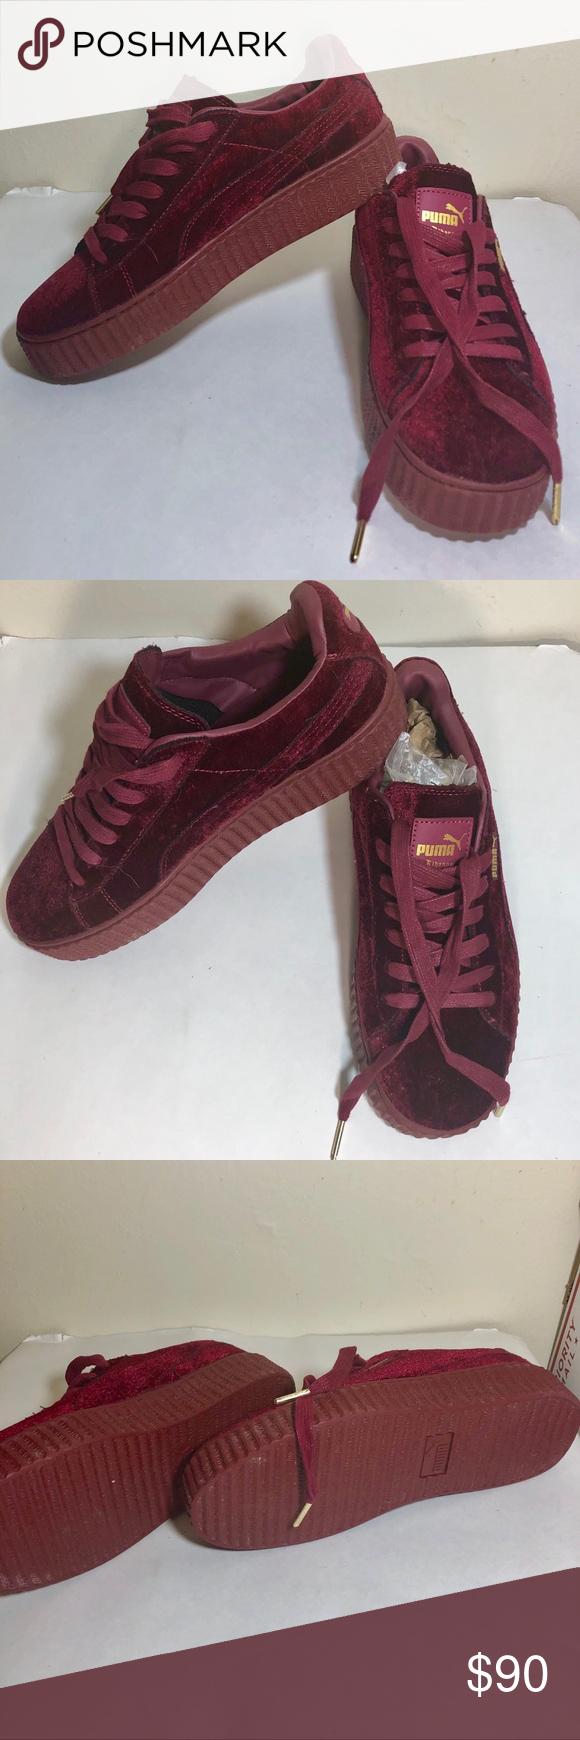 sports shoes 2b4f0 a99cb Women's Puma Rihanna Fenty Red Velvet Creeper 8.5 Women's ...